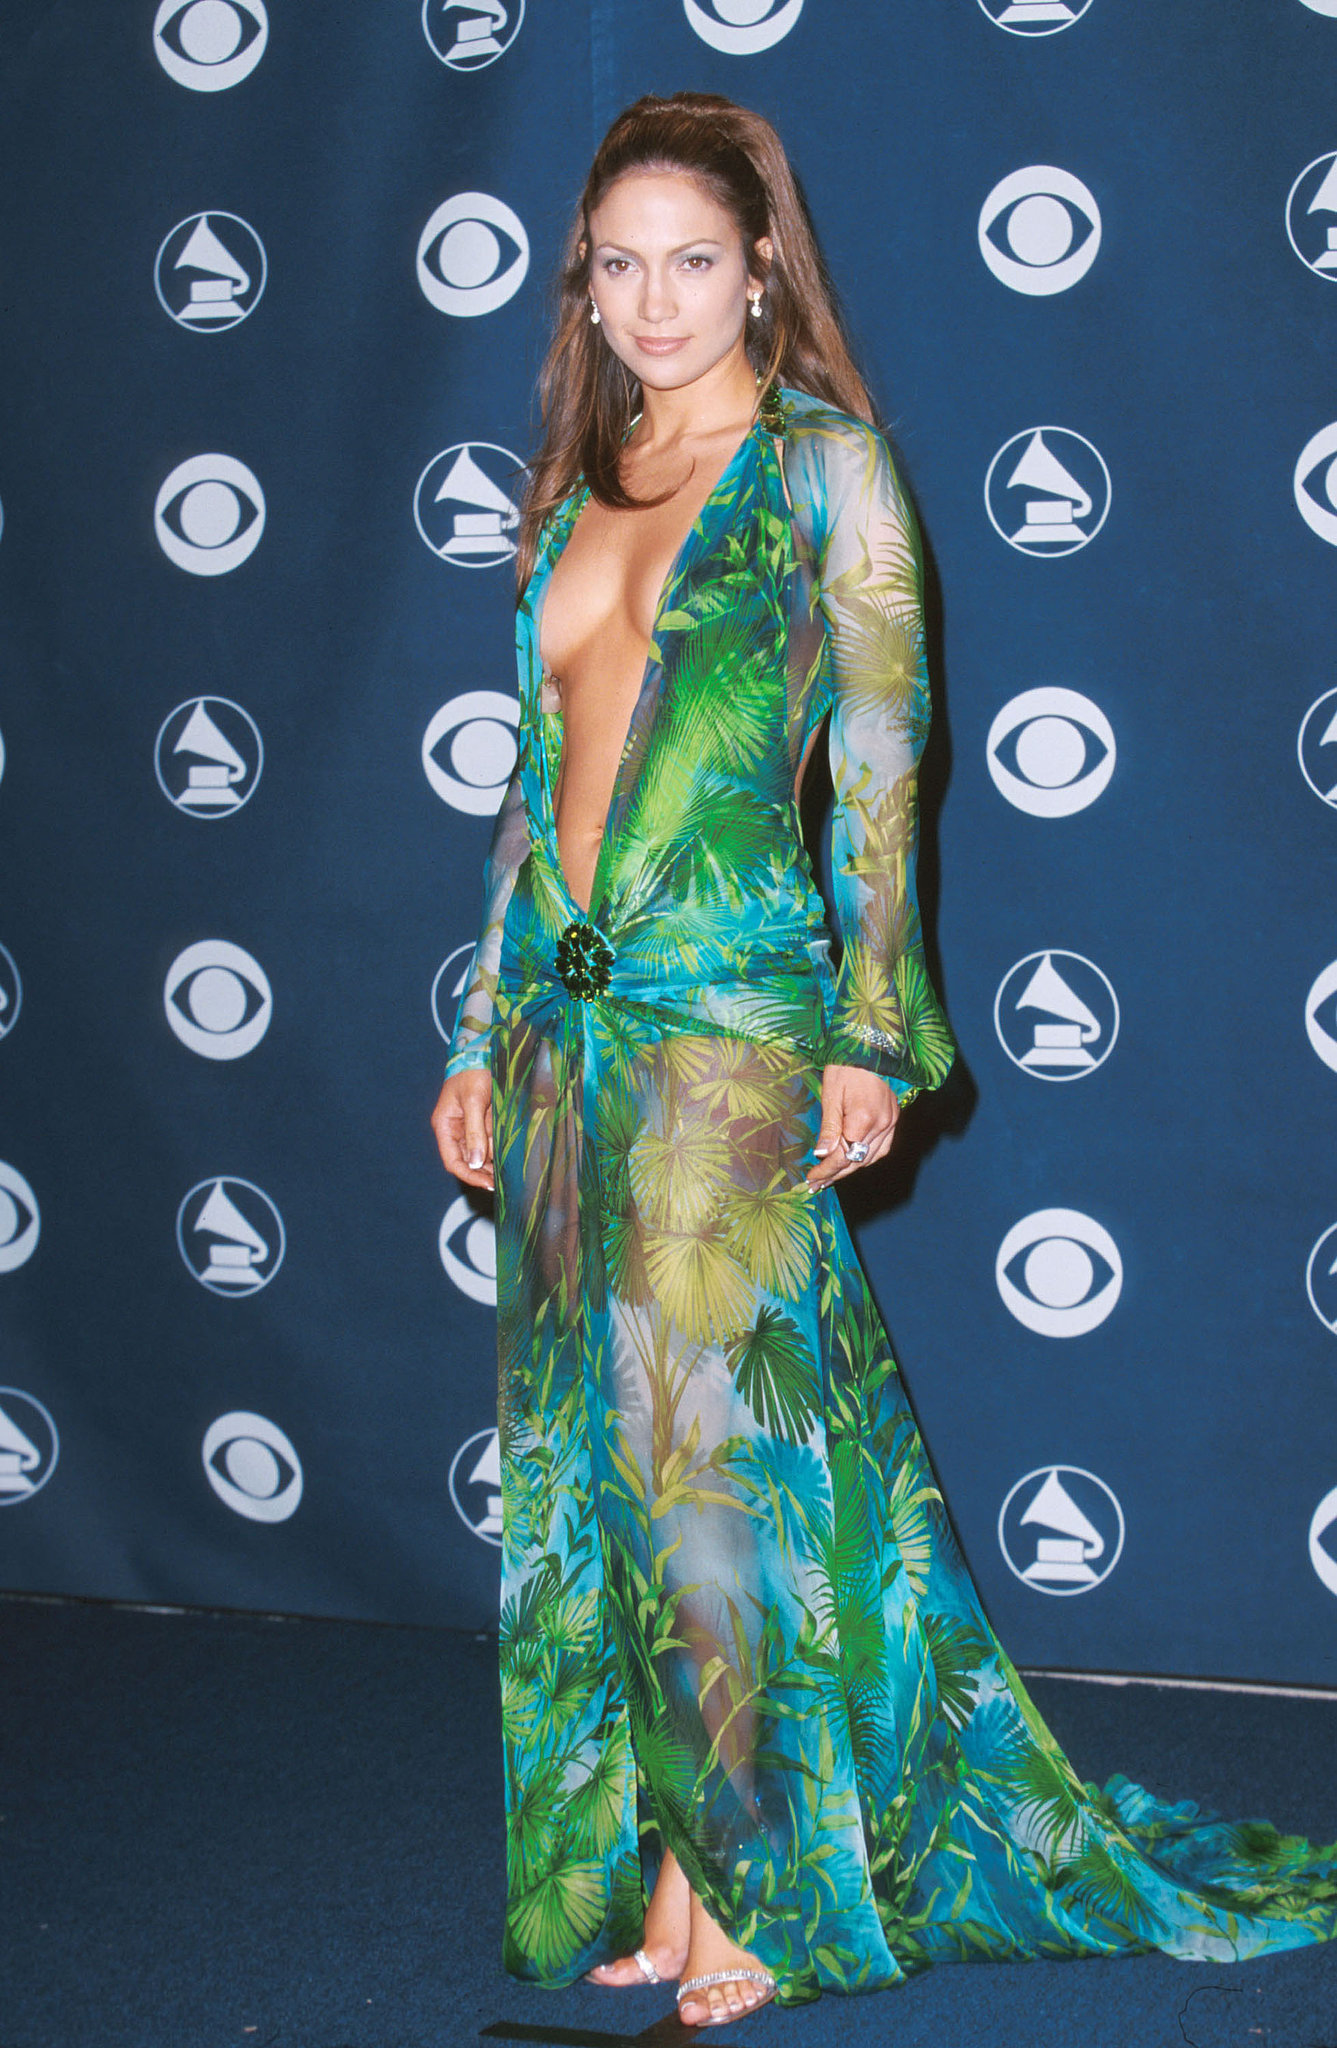 Grammy Awards in 2000